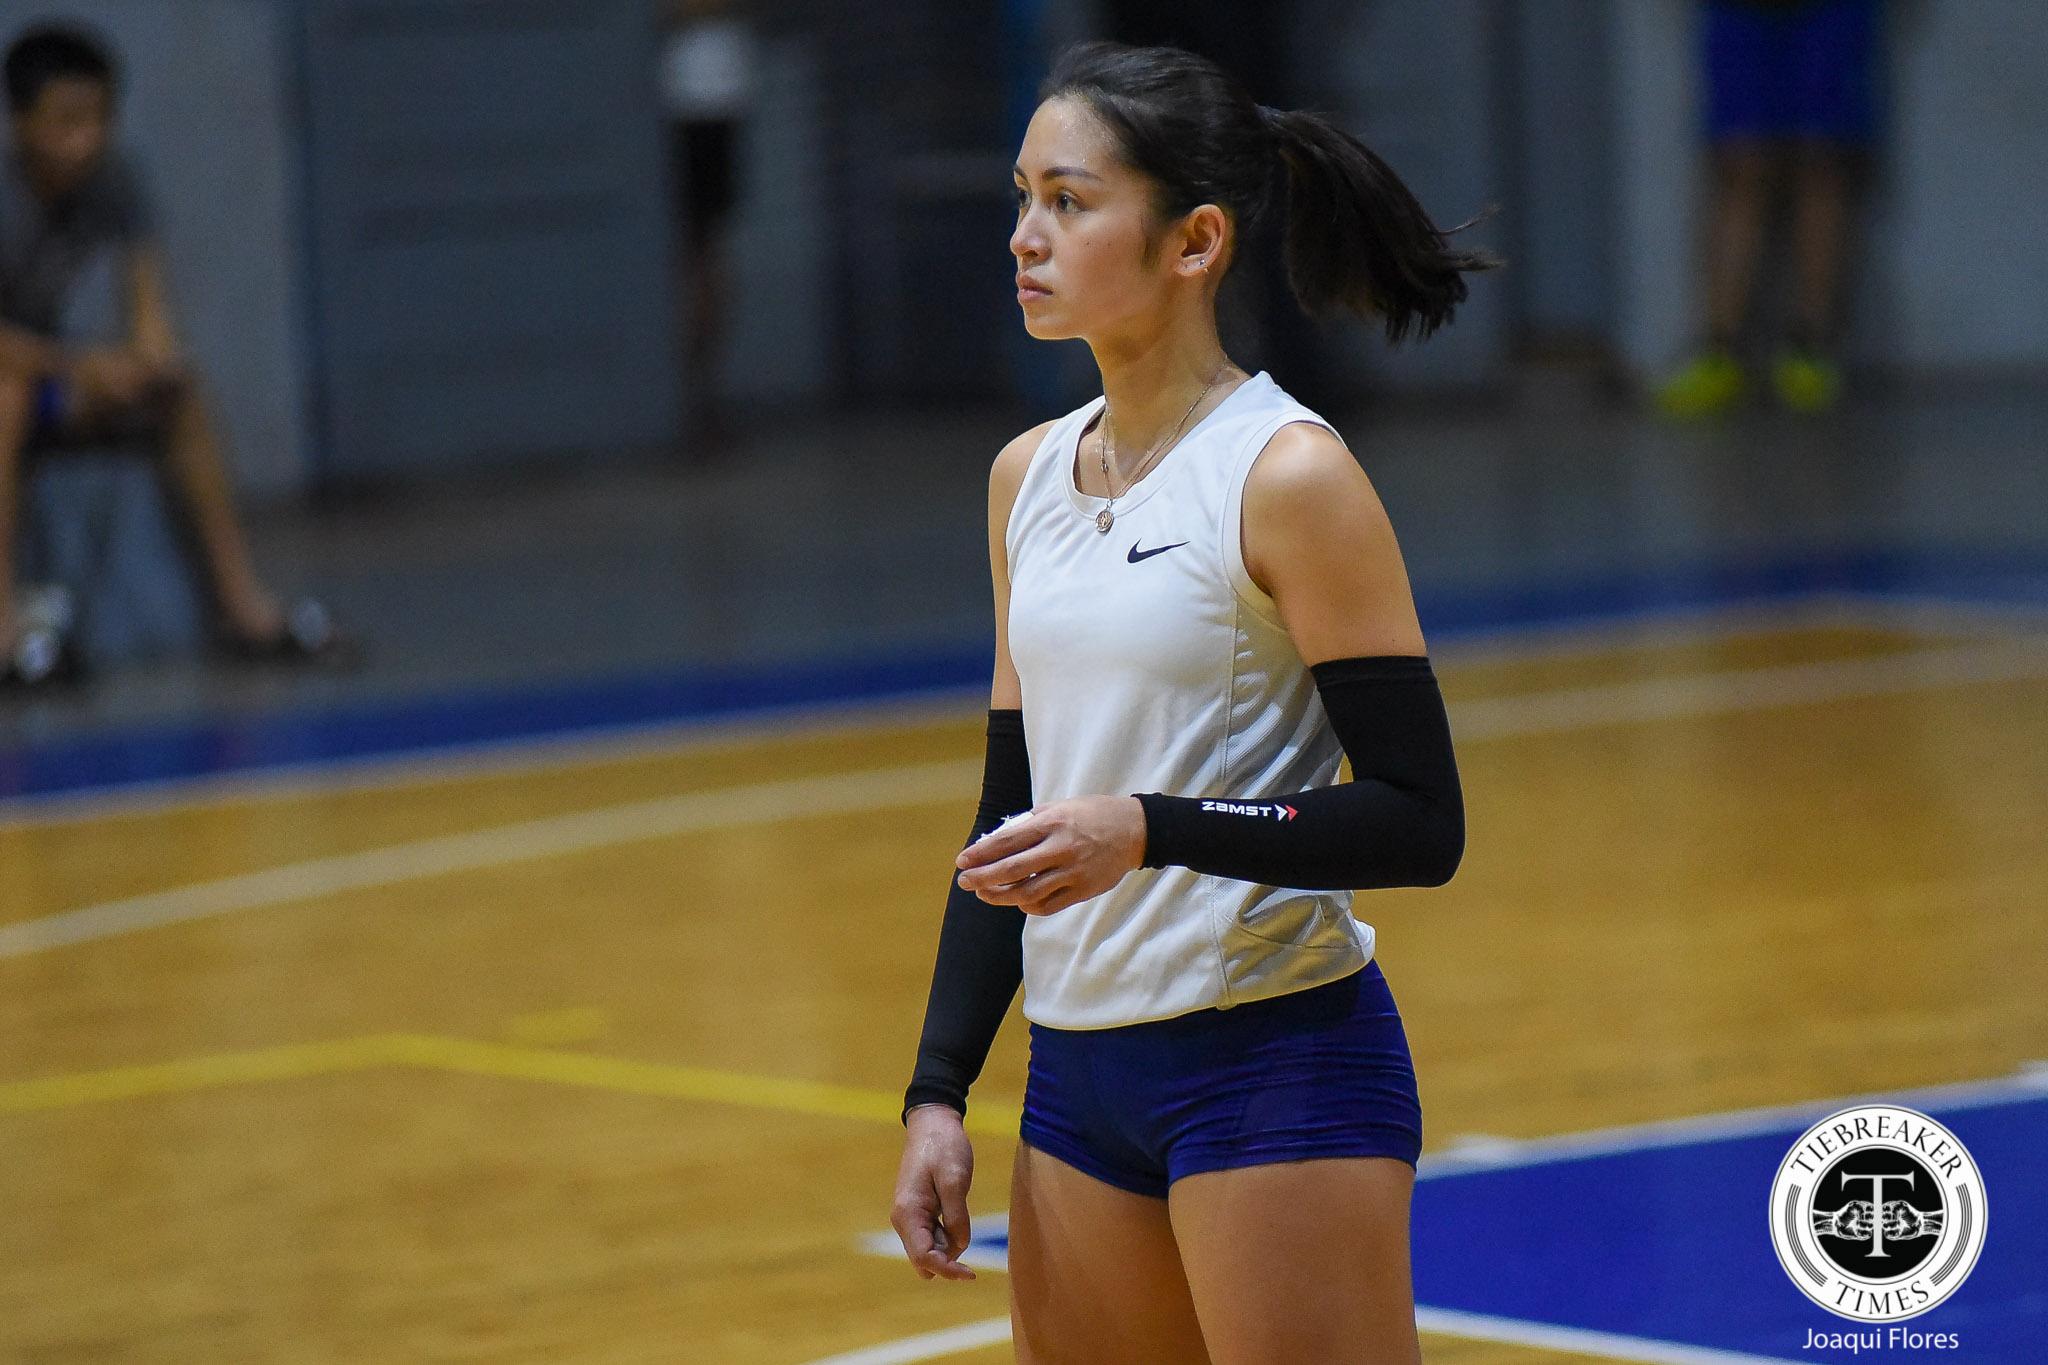 LVPI-tryouts-Lazaro-7510 Alyssa Valdez, Denden Lazaro call on athletes to make a stand News PVL Volleyball  - philippine sports news